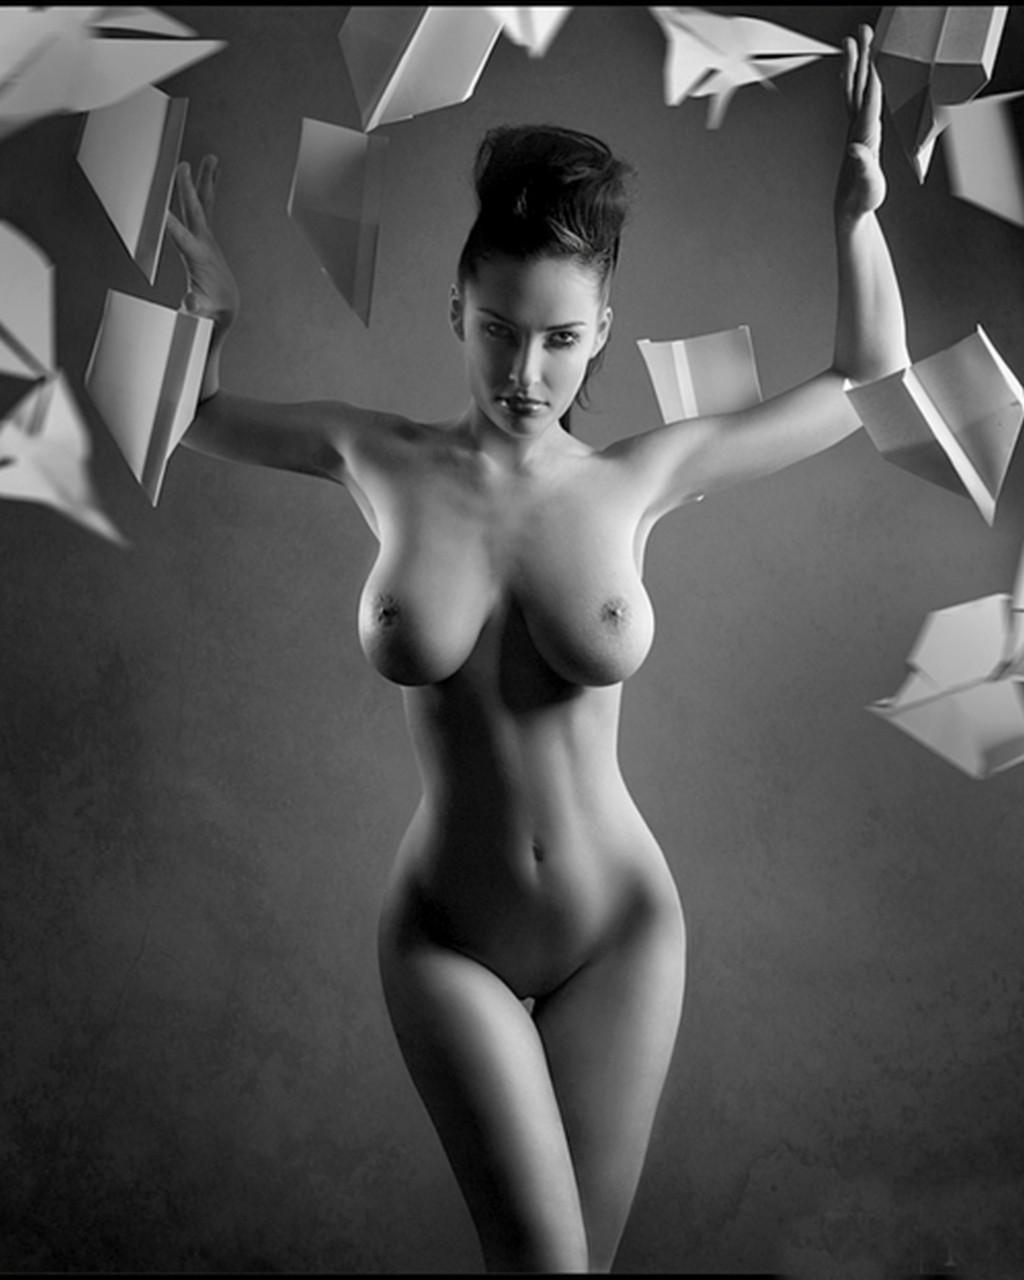 s-idealnoy-figuroy-erotika